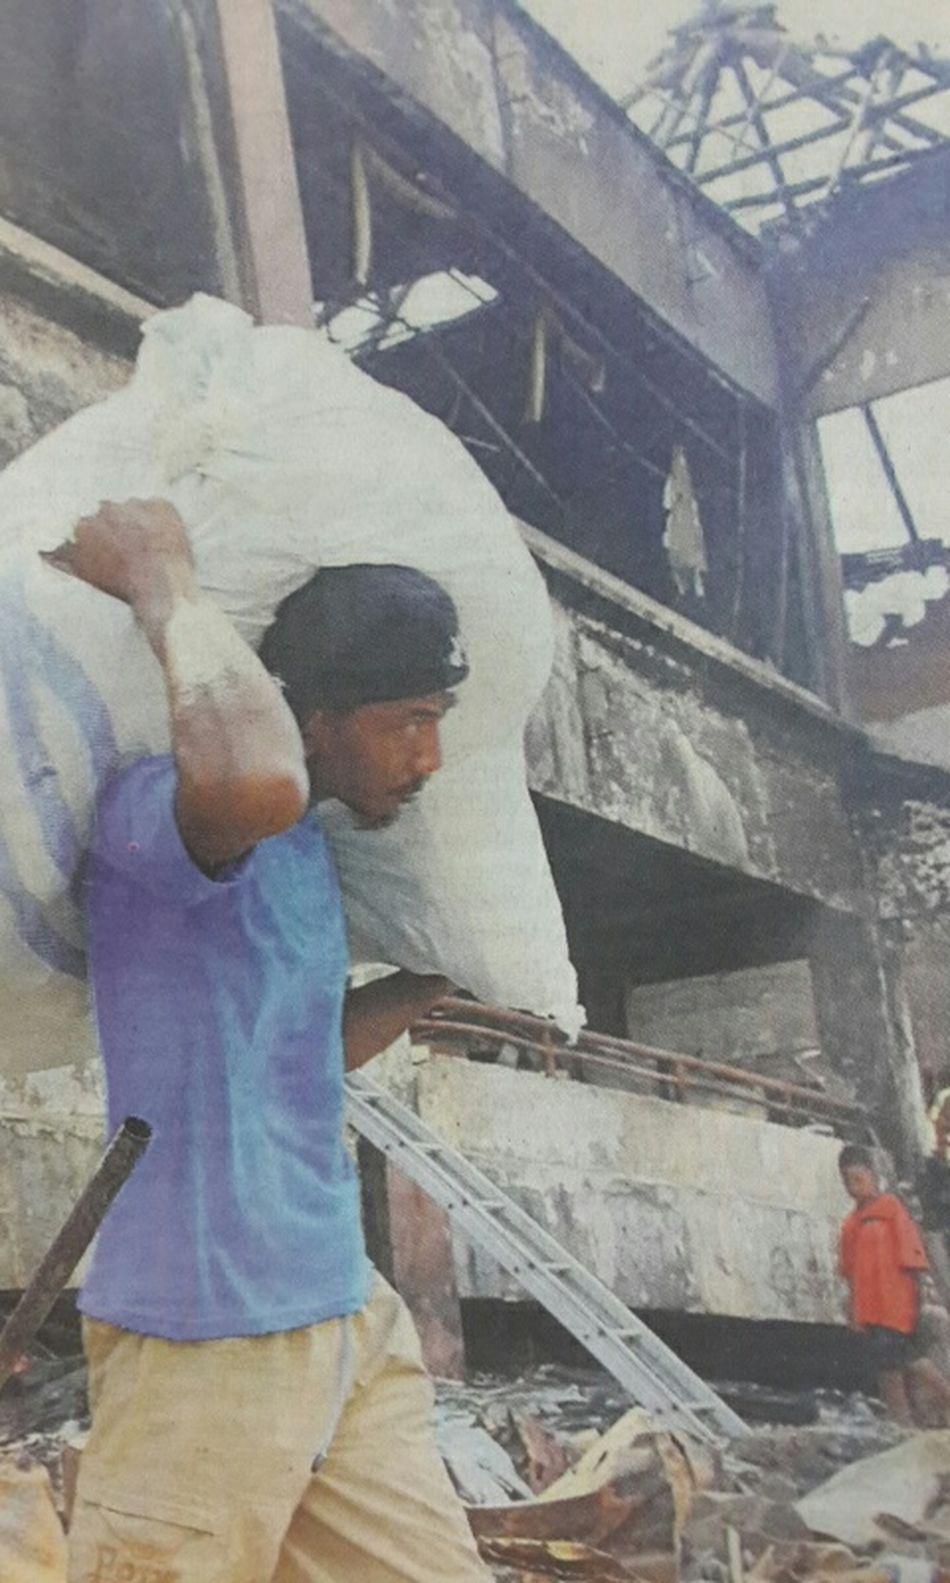 "Capturing original picture (Kompas/Harry Susilo) on page 26th of Kompas Daily Newspaper (10/2/15) had titled ""Pasar Baru Cikarang Ludes Terbakar"". Pedagang Kebakaran Korsleting Listrik"